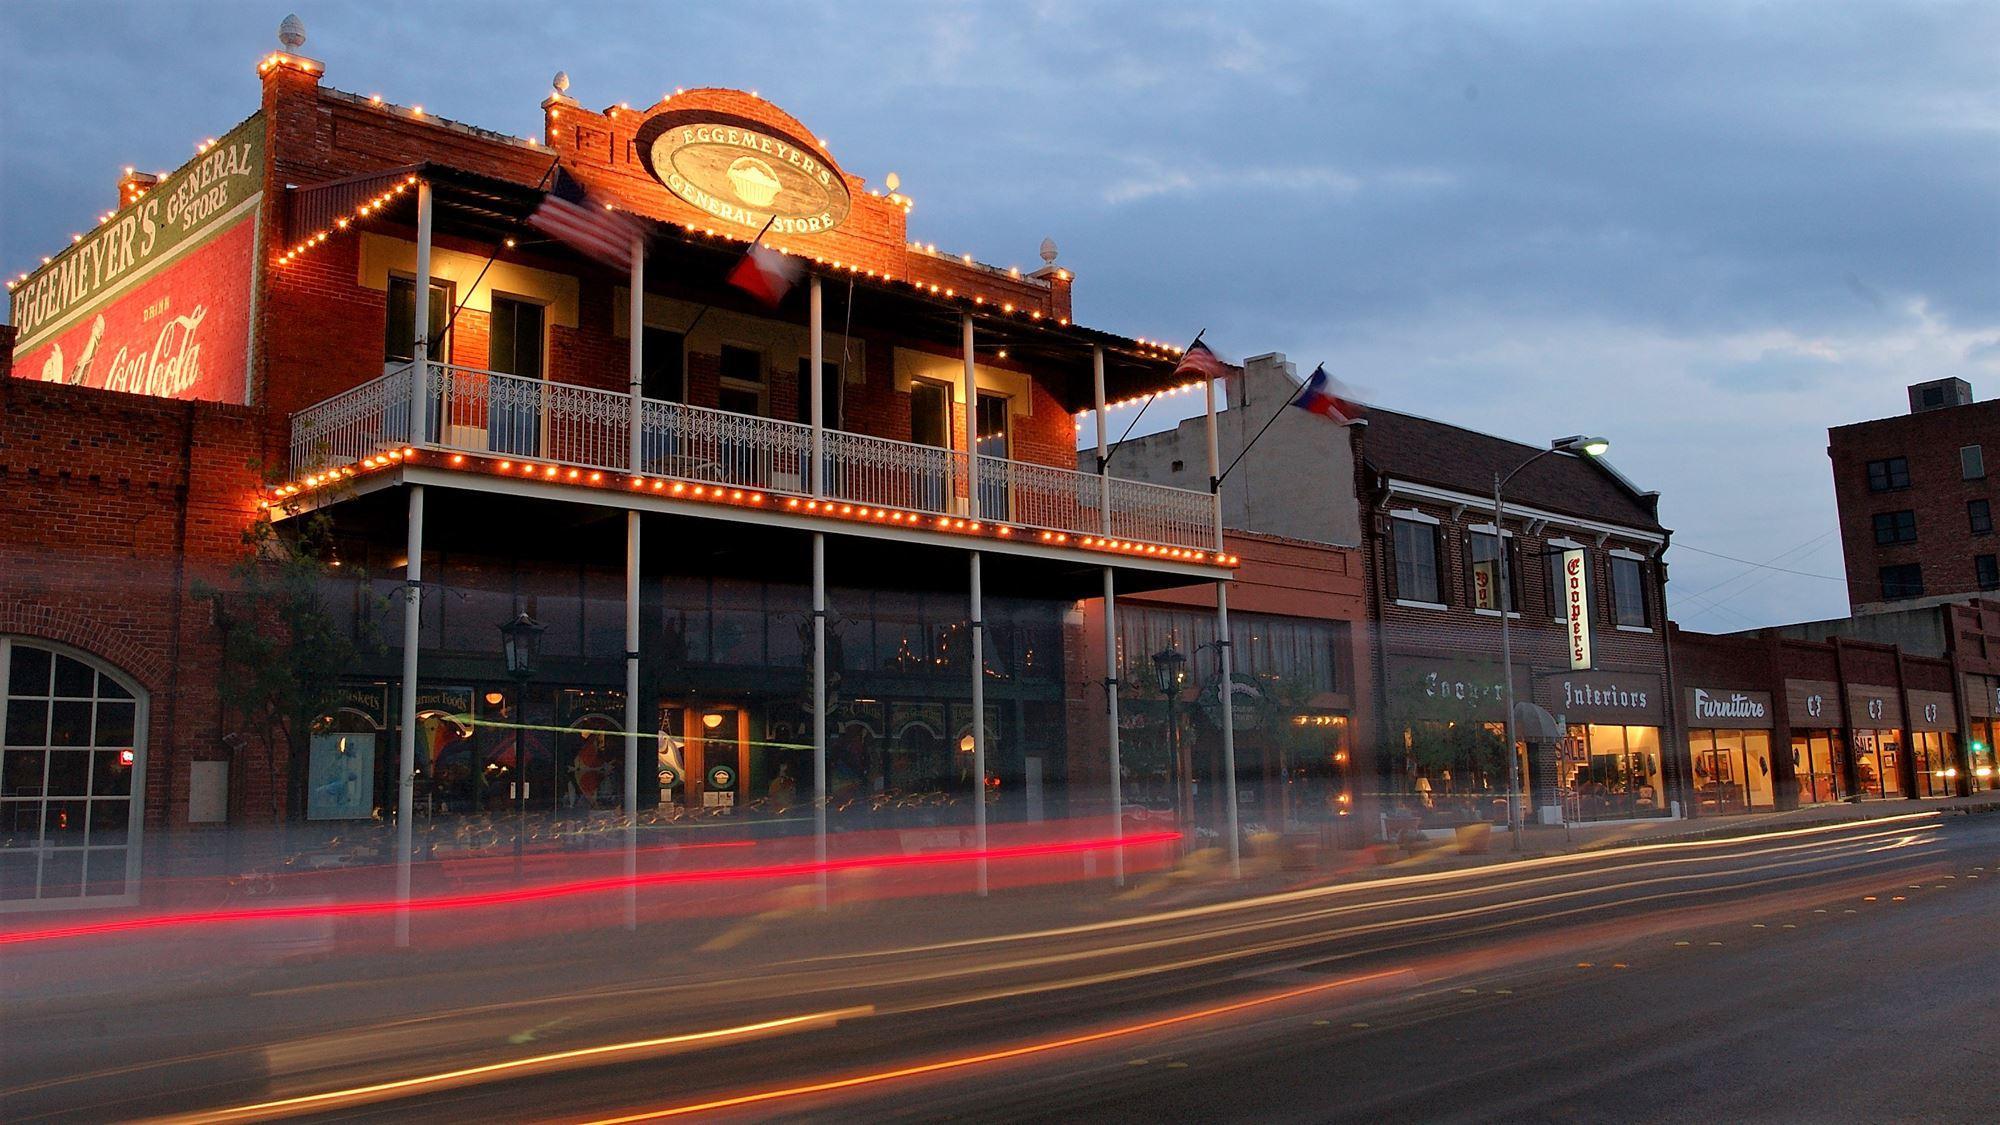 Plan a Road Trip to San Angelo, Texas